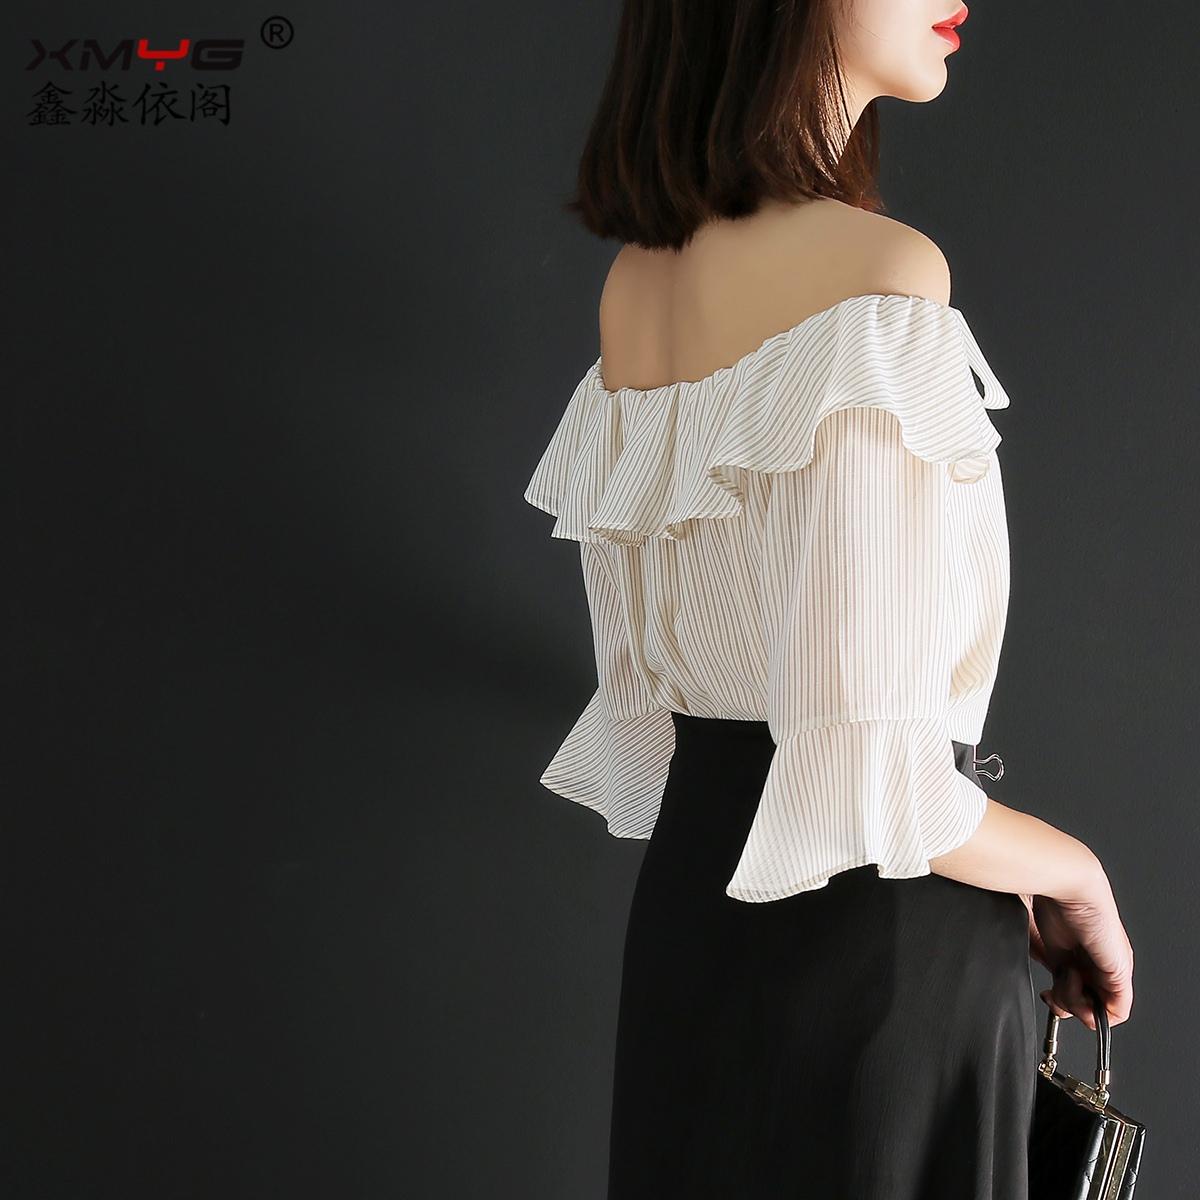 Off shoulder top womens spring and summer 2021 new Pinstripe Ruffle short sleeve chic Hong Kong sexy off shoulder T-shirt